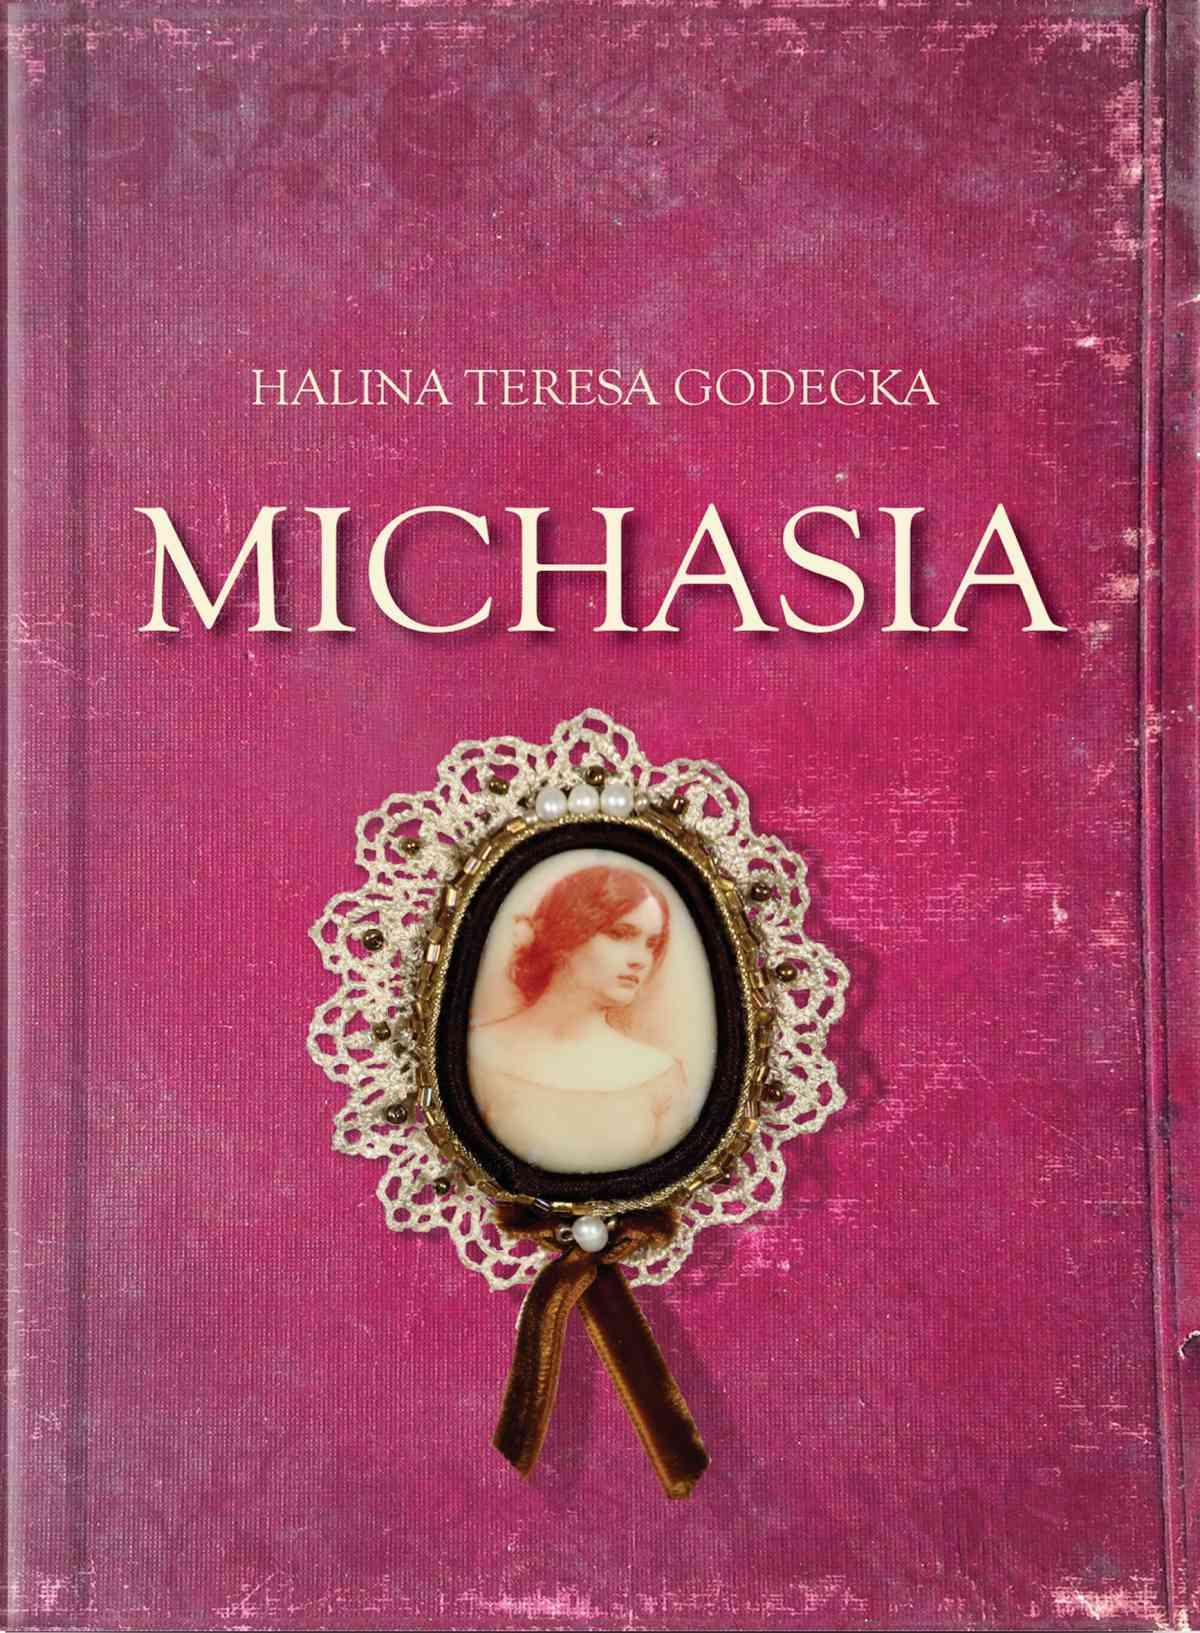 Michasia - Ebook (Książka na Kindle) do pobrania w formacie MOBI